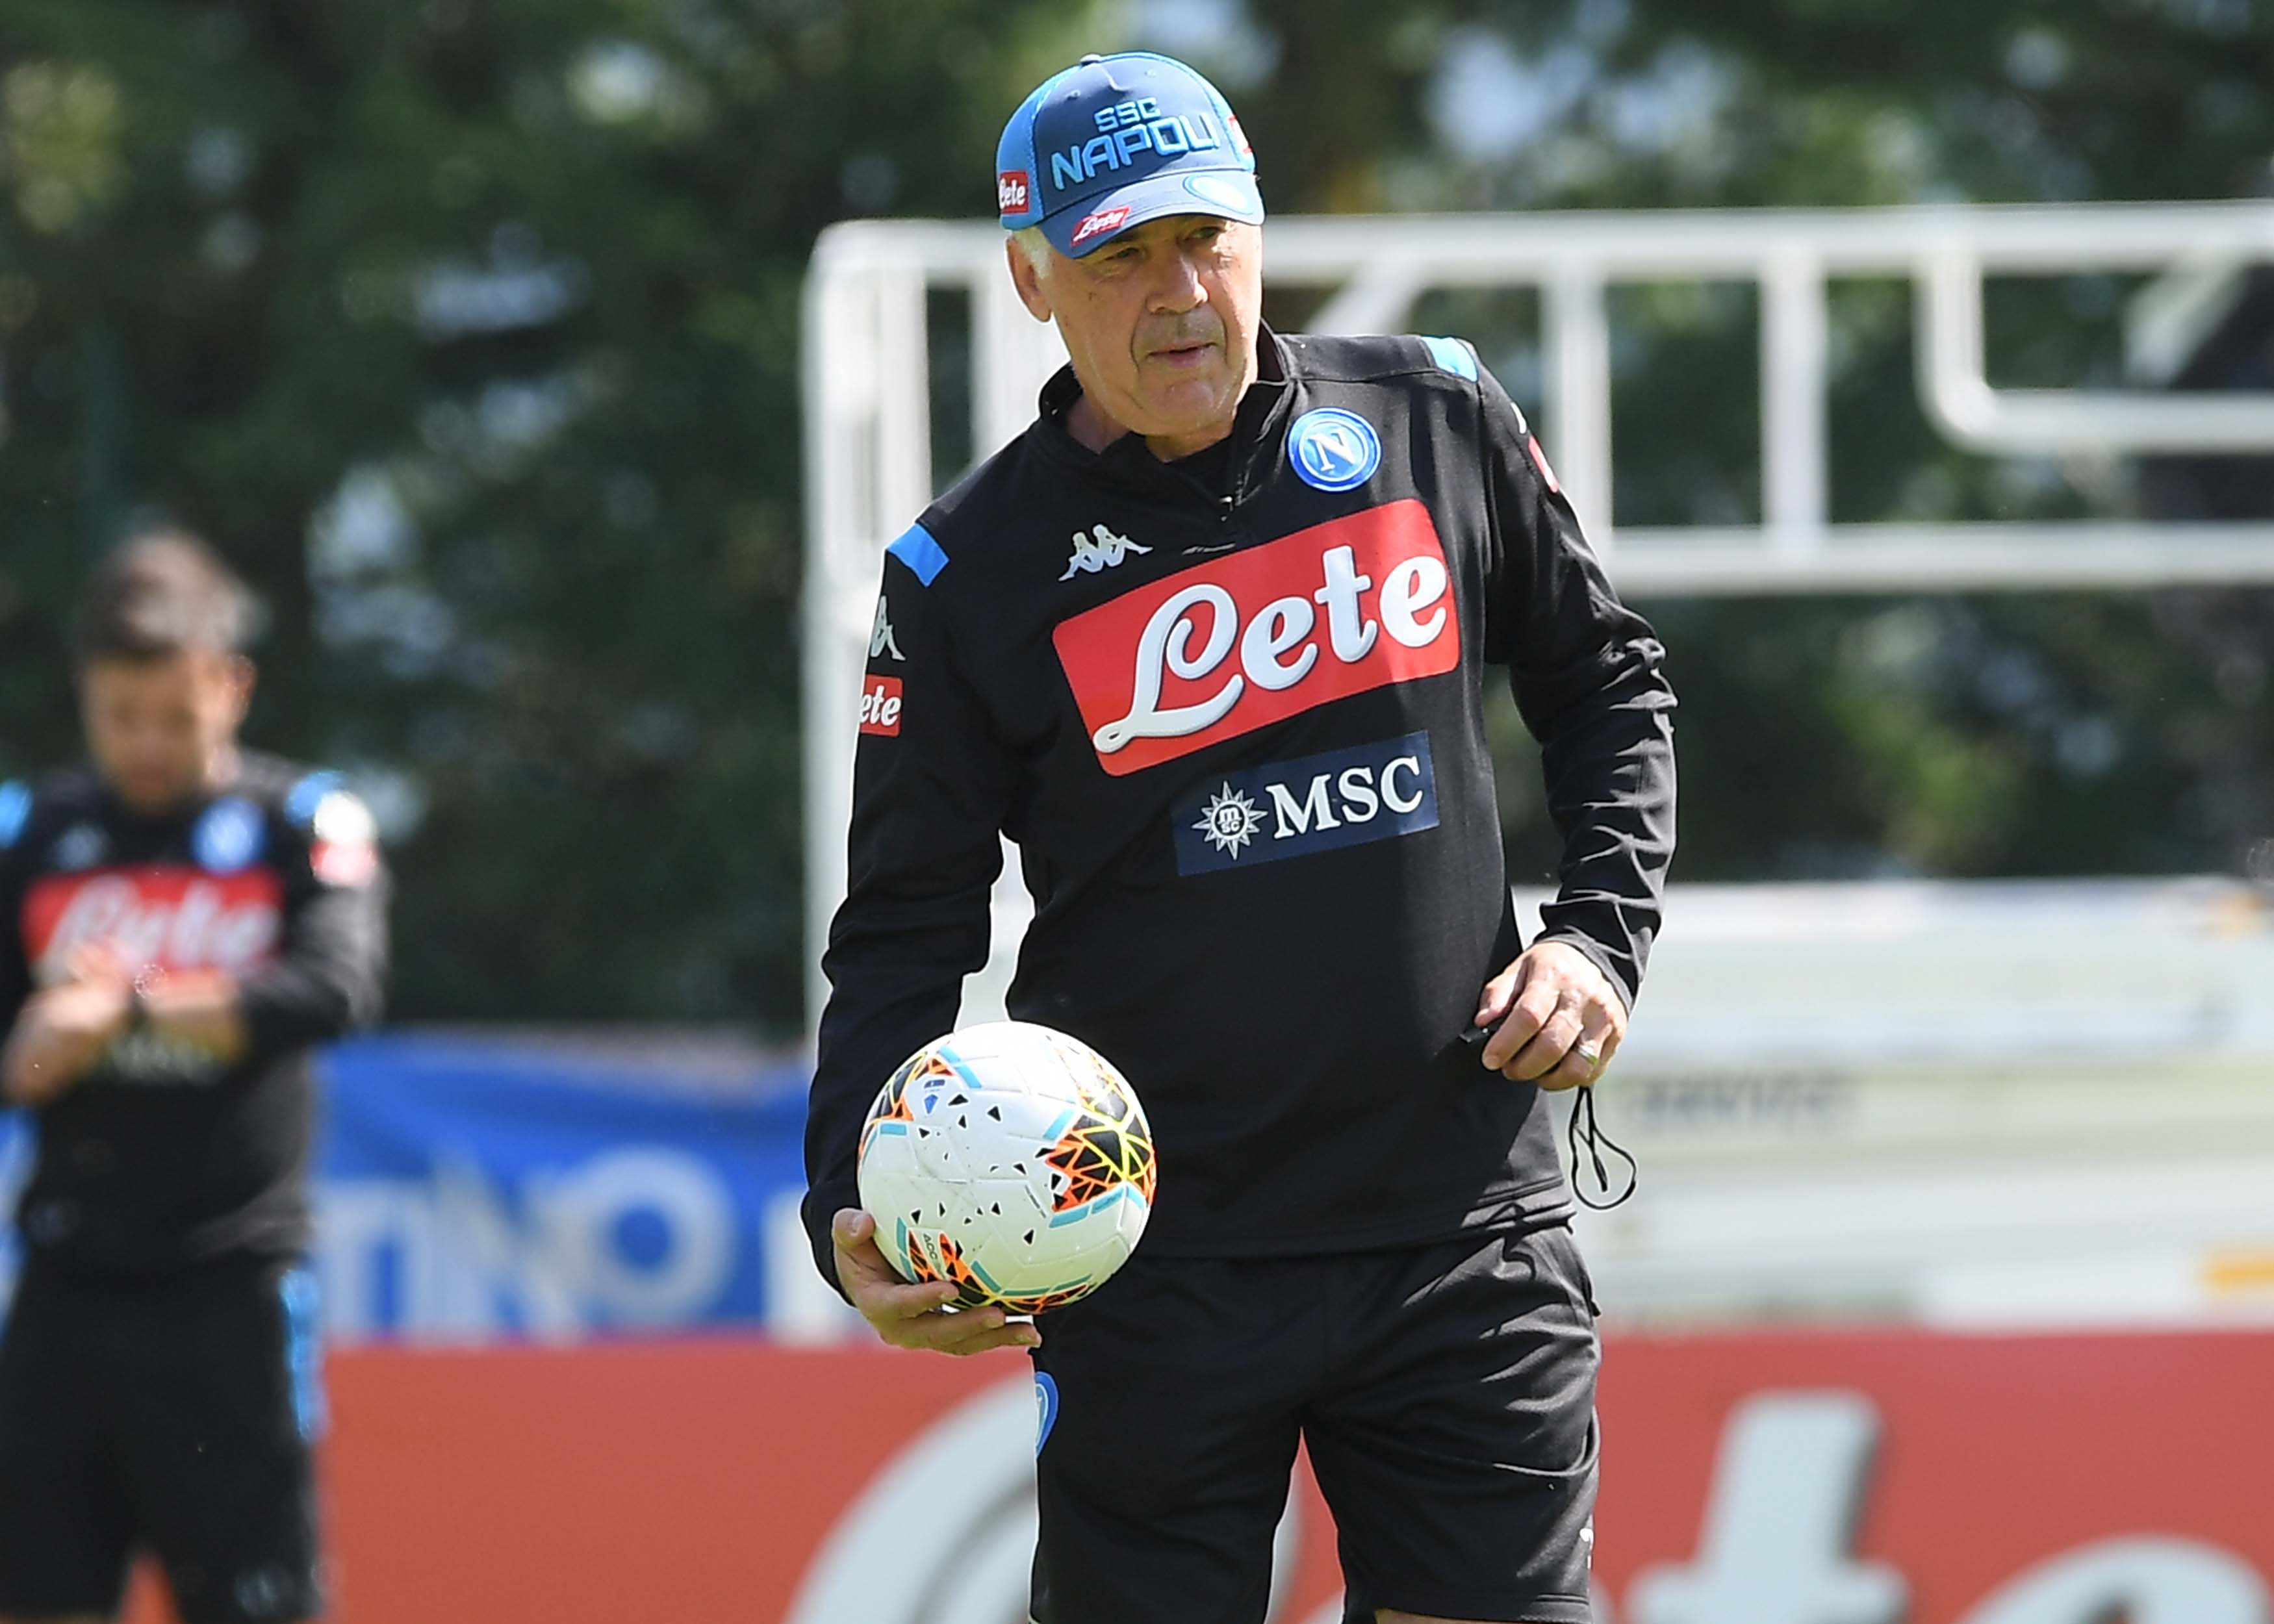 SSC Napoli Pre-Season Training Camp